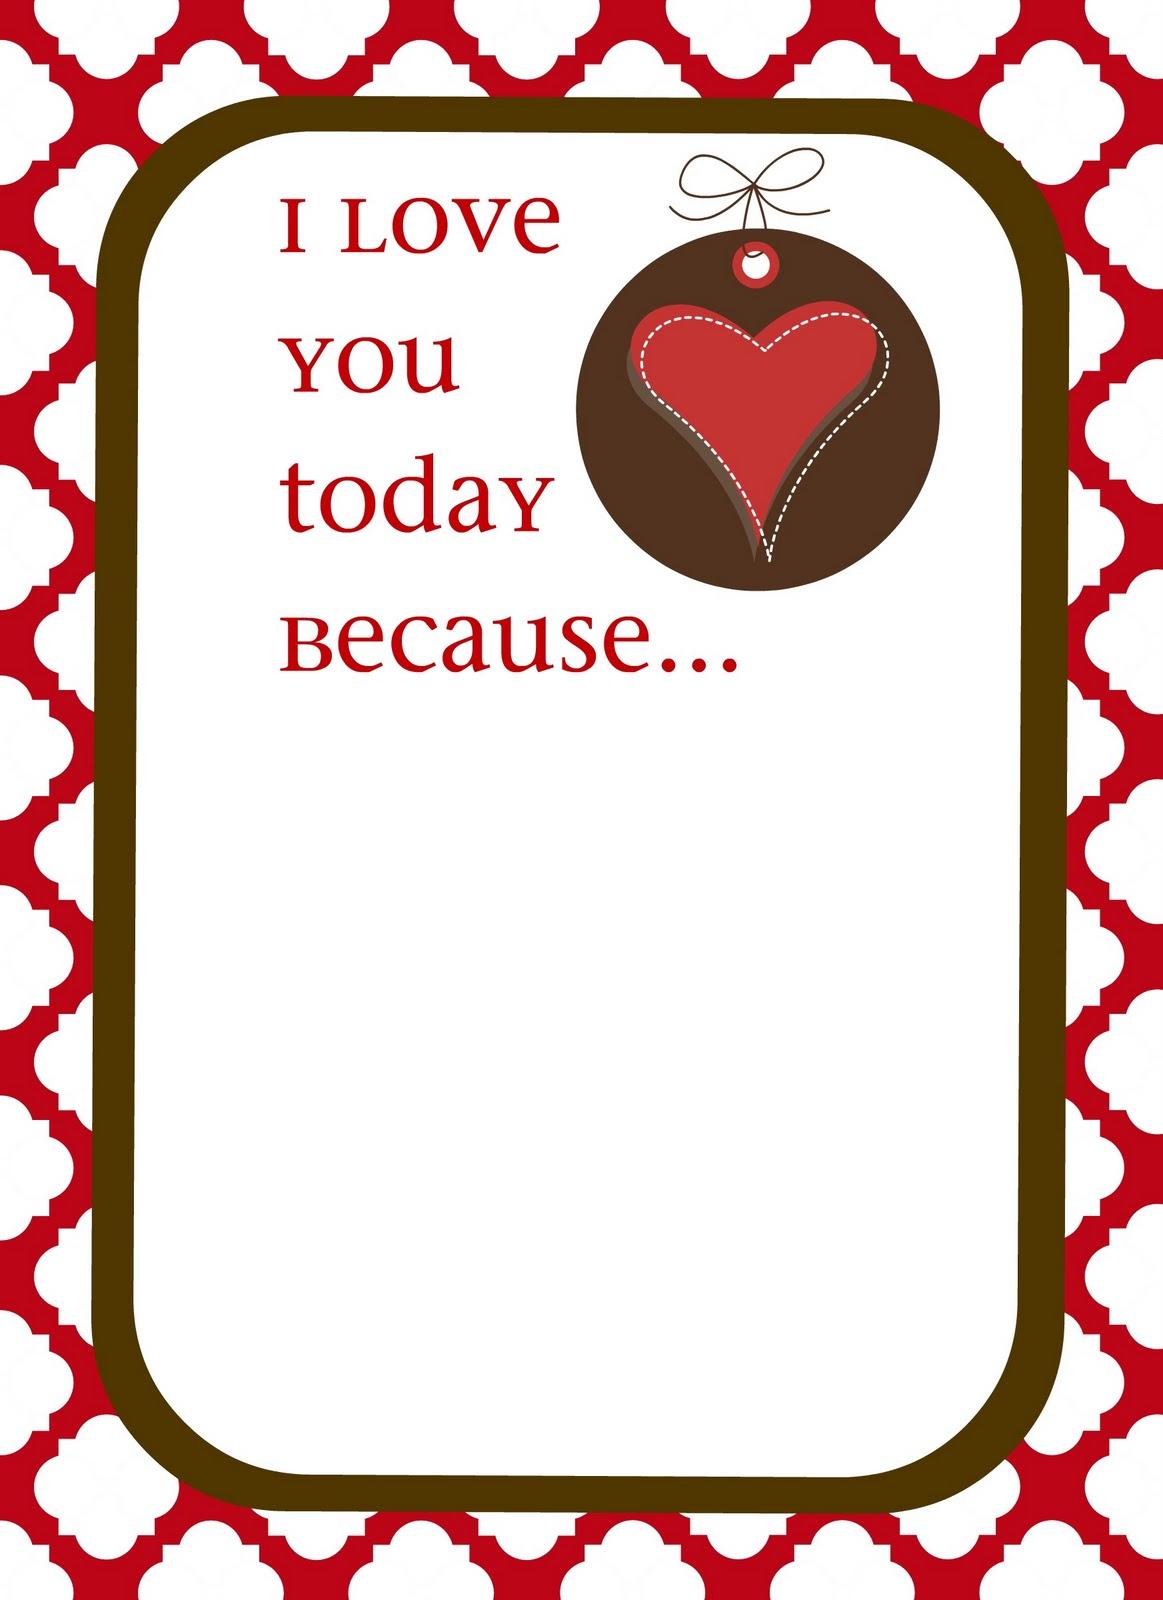 {FREE PRINTABLE} i love you today because - Creative Juice